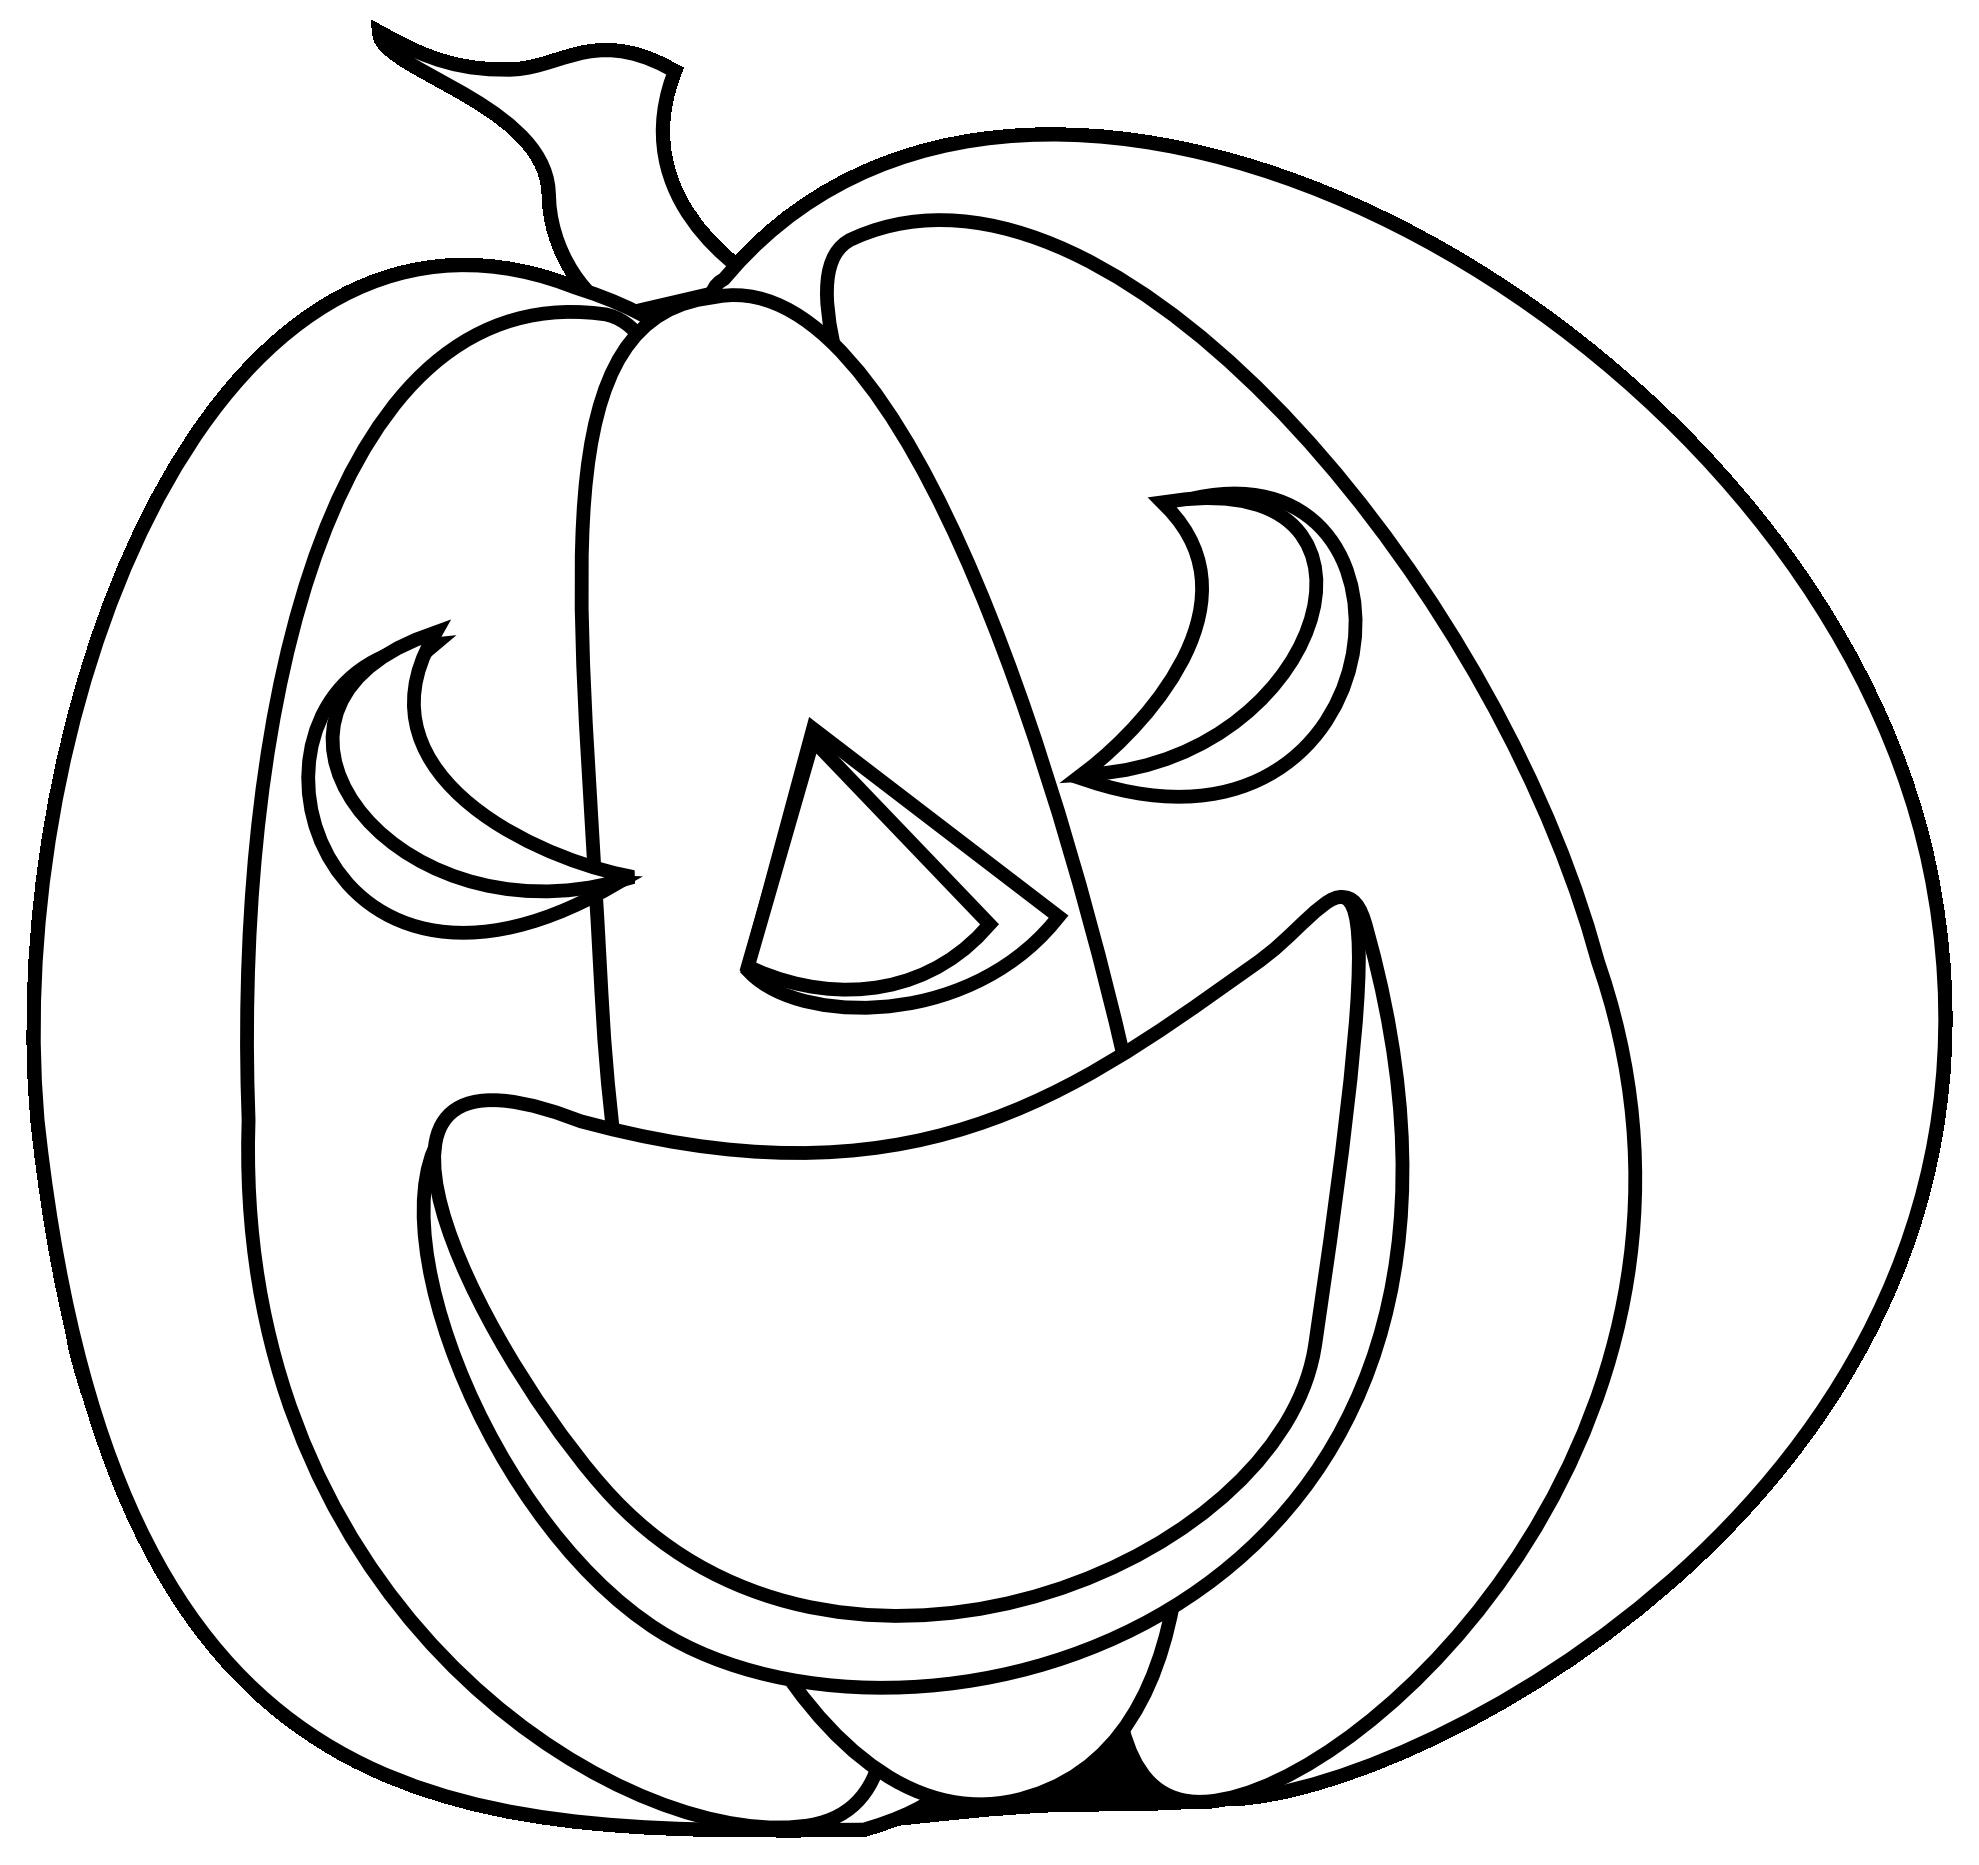 Pumpkin clipart border. Black and white clip